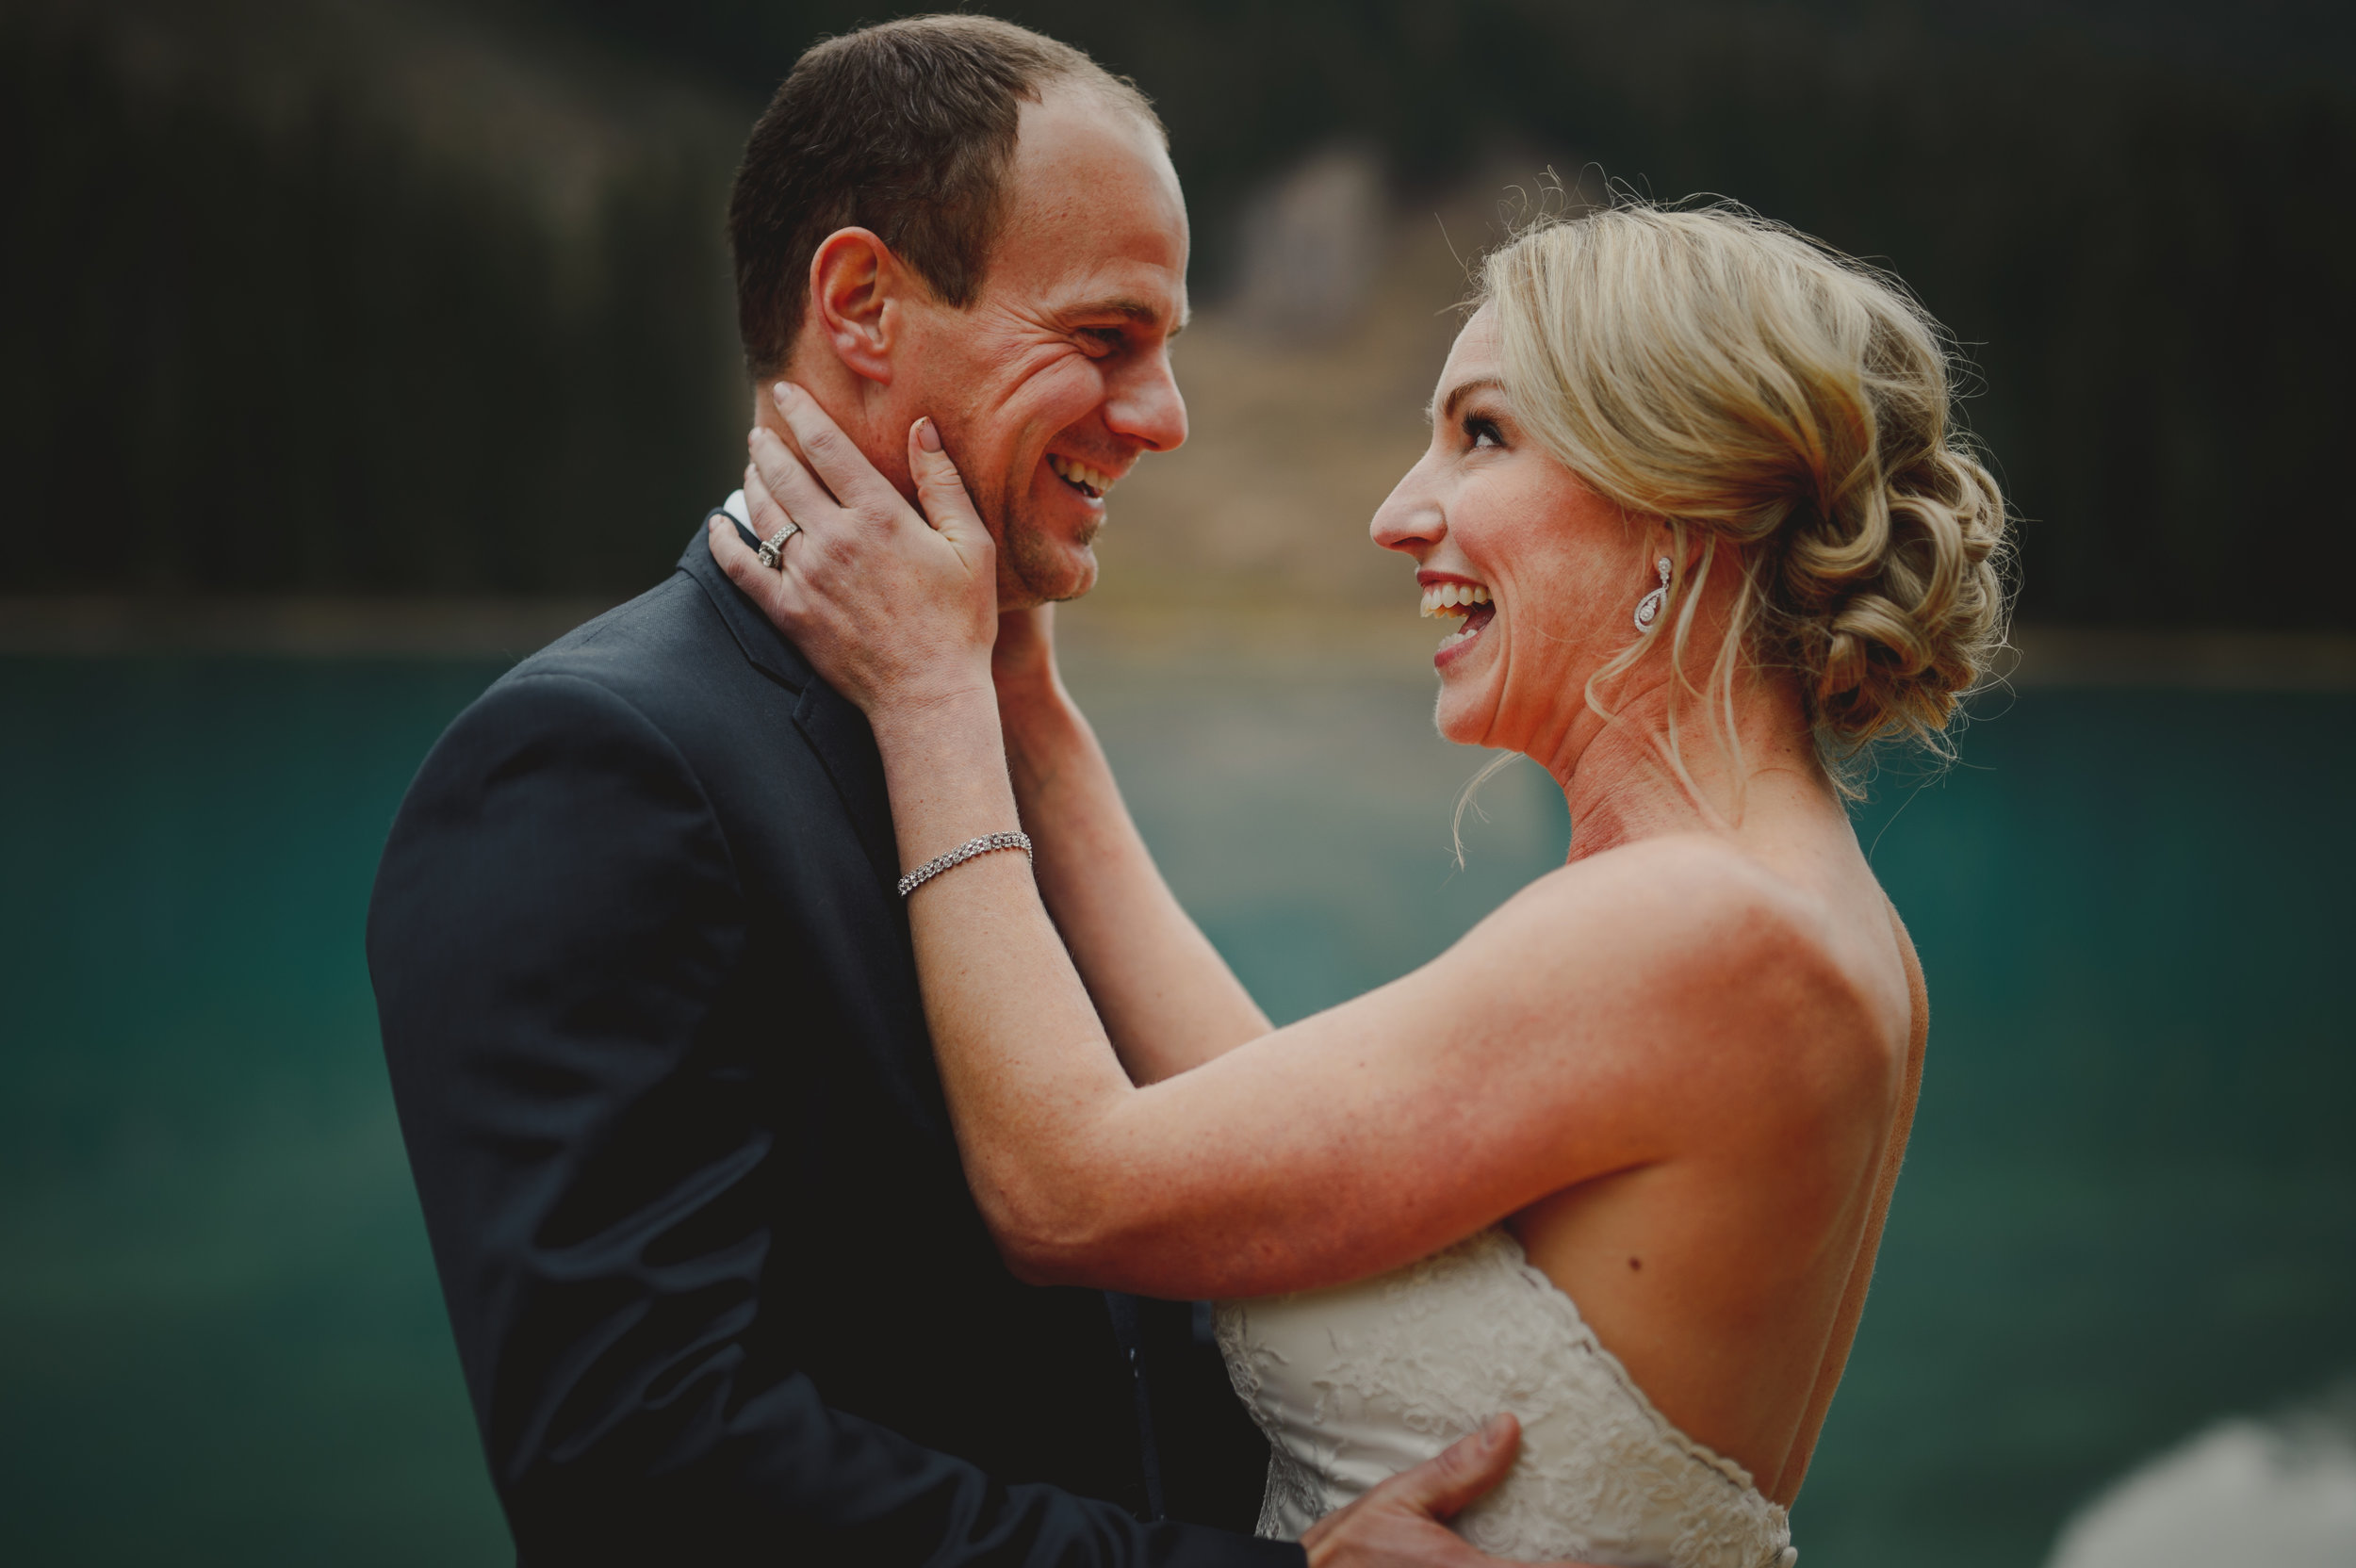 Banff-Wedding-Photographer-15.jpg